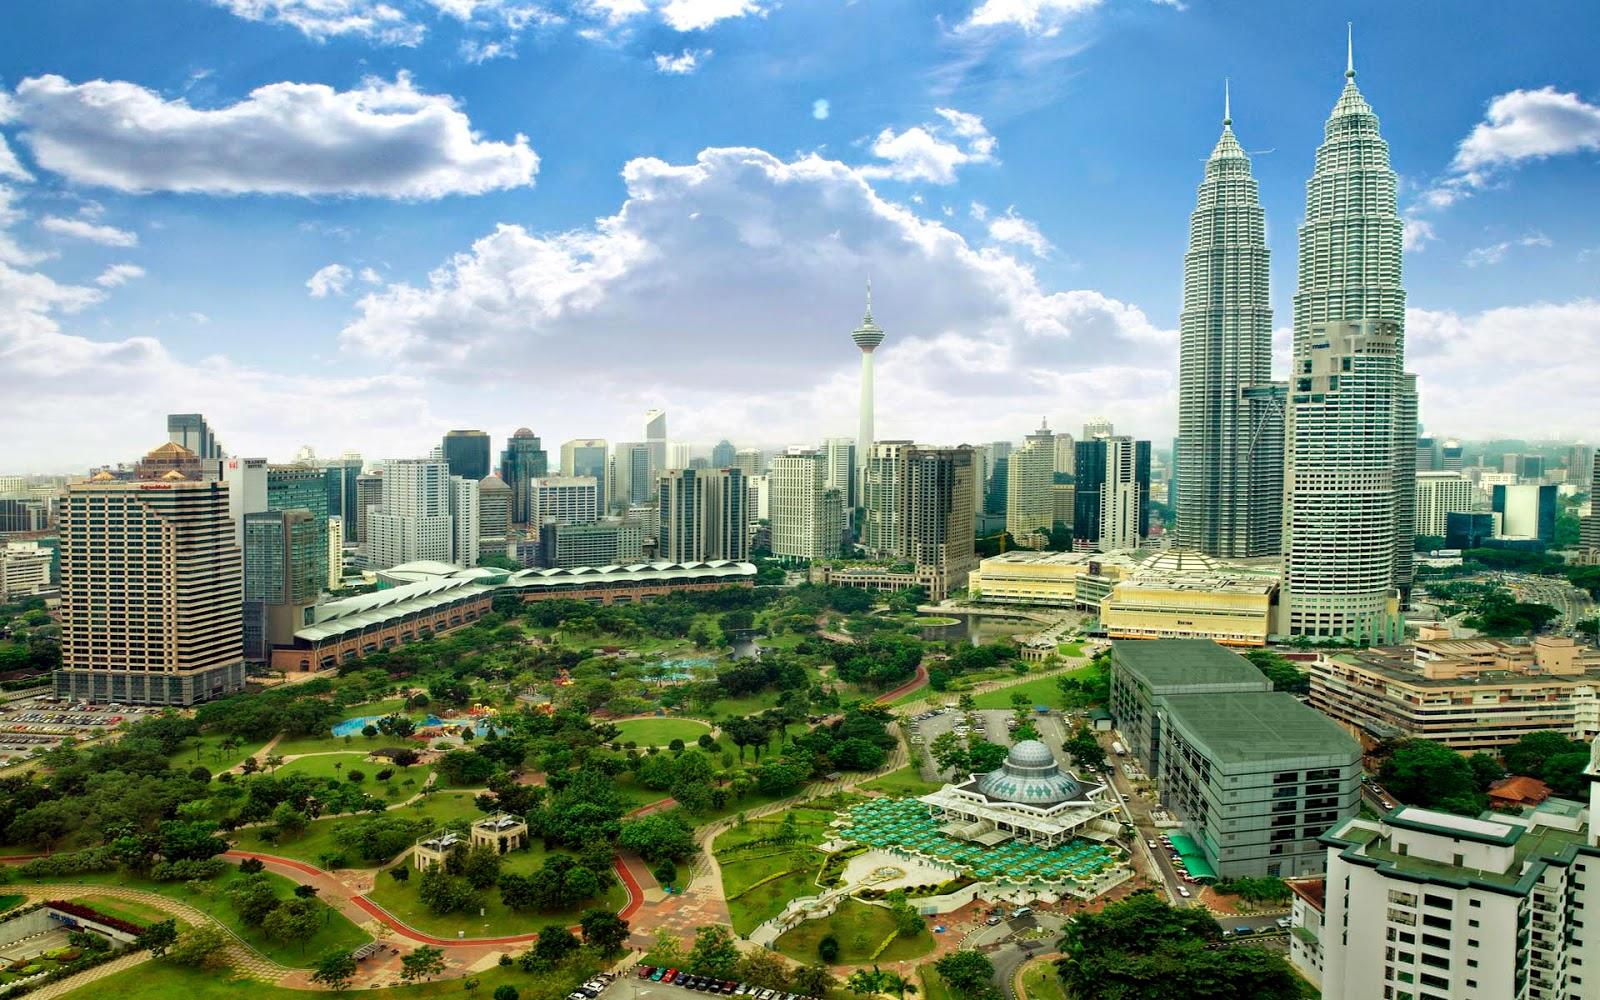 kebaikan dan keburukan pelancong asing Kebaikan dan keburukan tinggal di malaysia - melalui pandangan seorang pelancong.